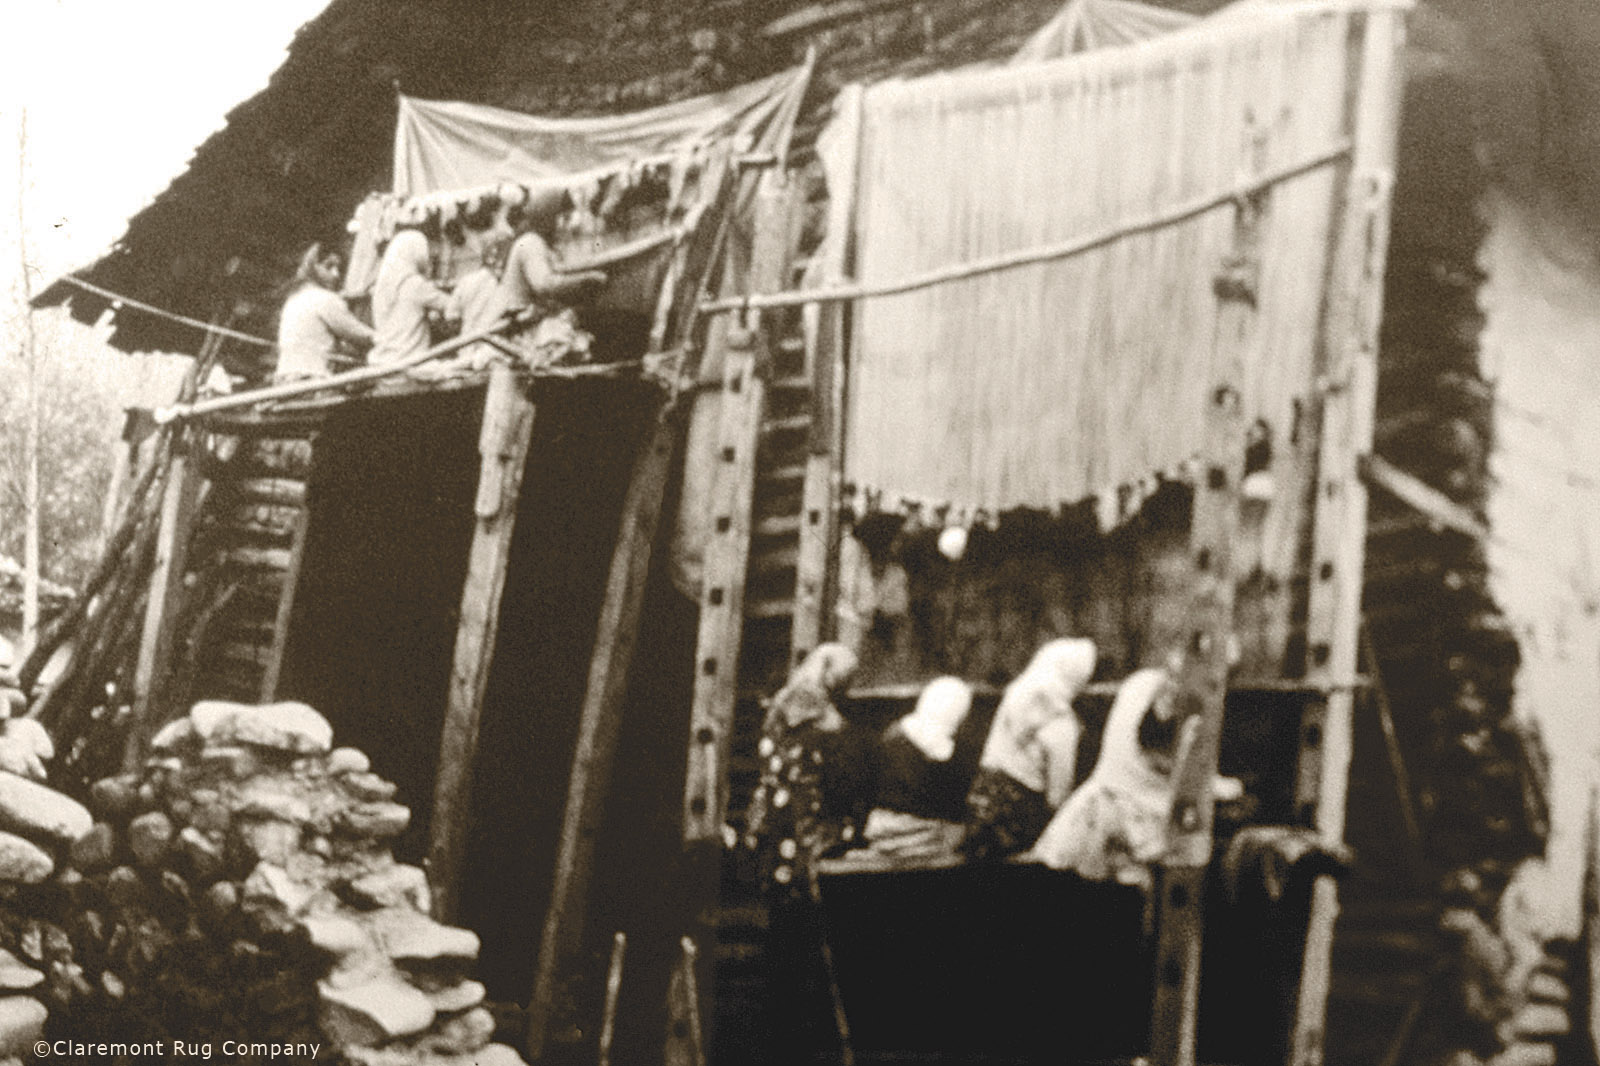 Weavers working on vertical loom Azerbaijan, circa 1900